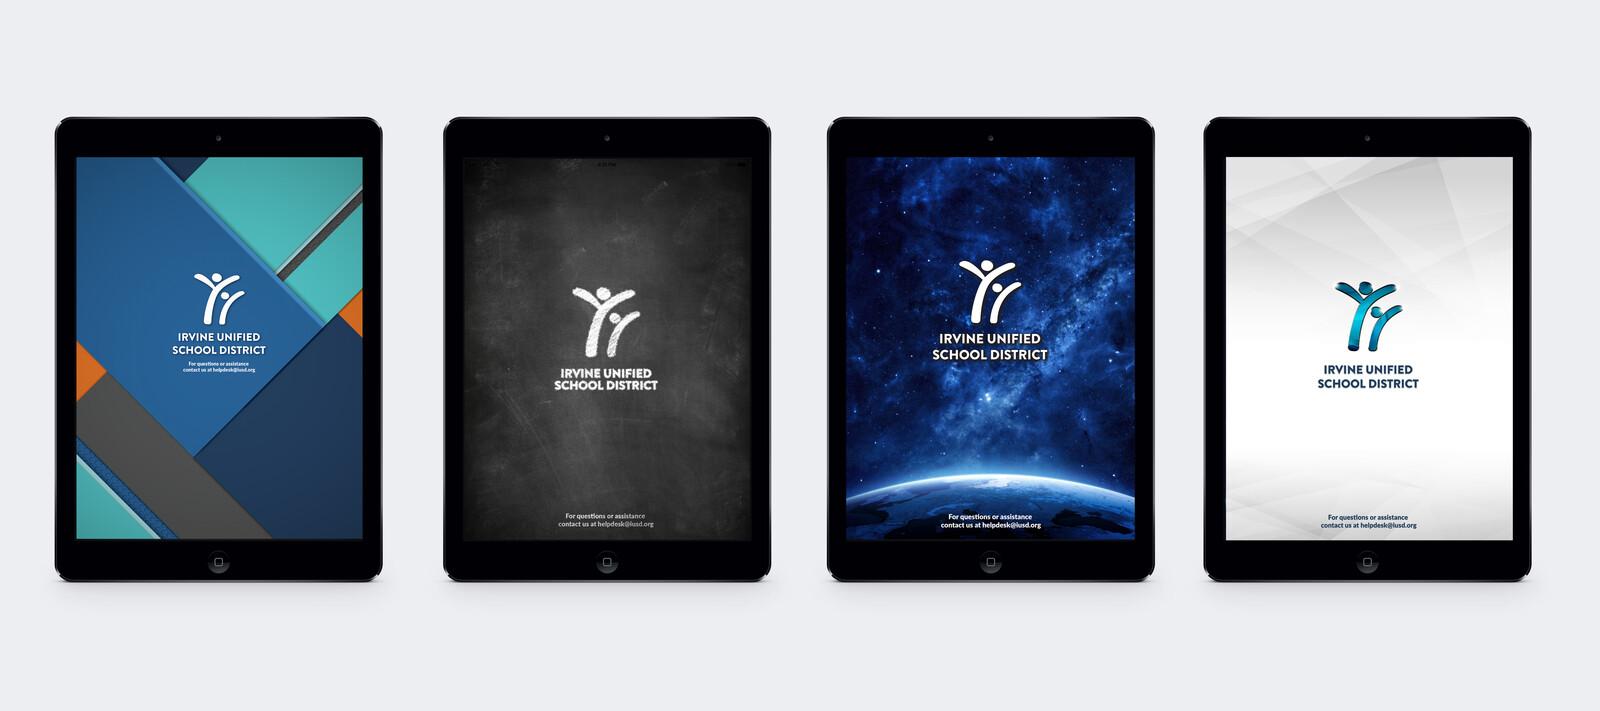 IUSD iPad Backgrounds